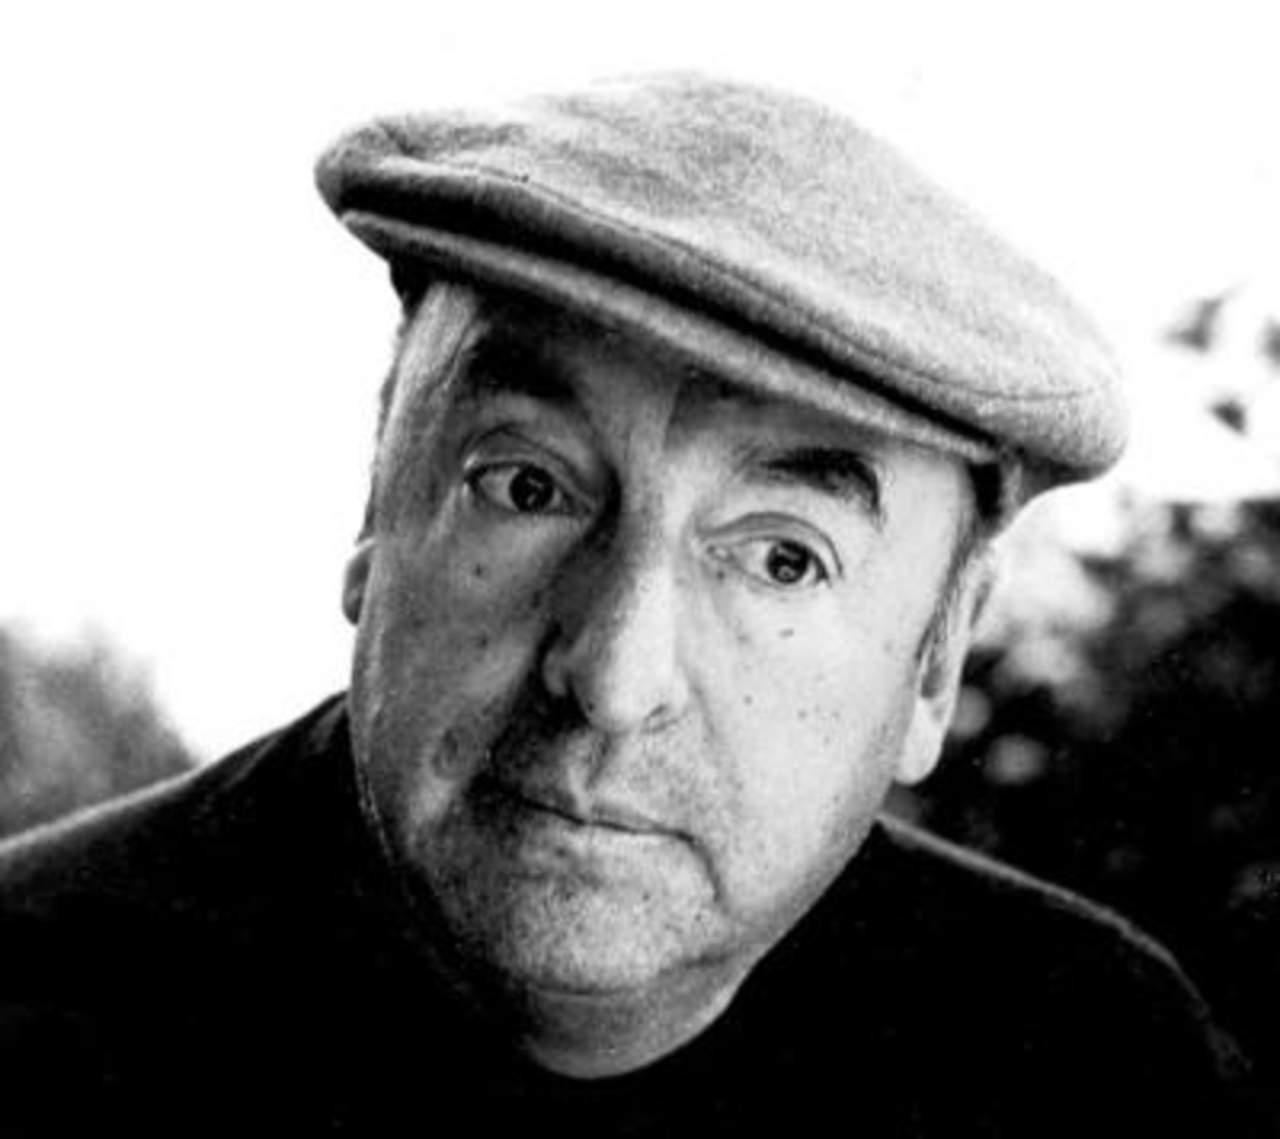 1973: Da su último respiro Pablo Neruda, reconocido poeta chileno